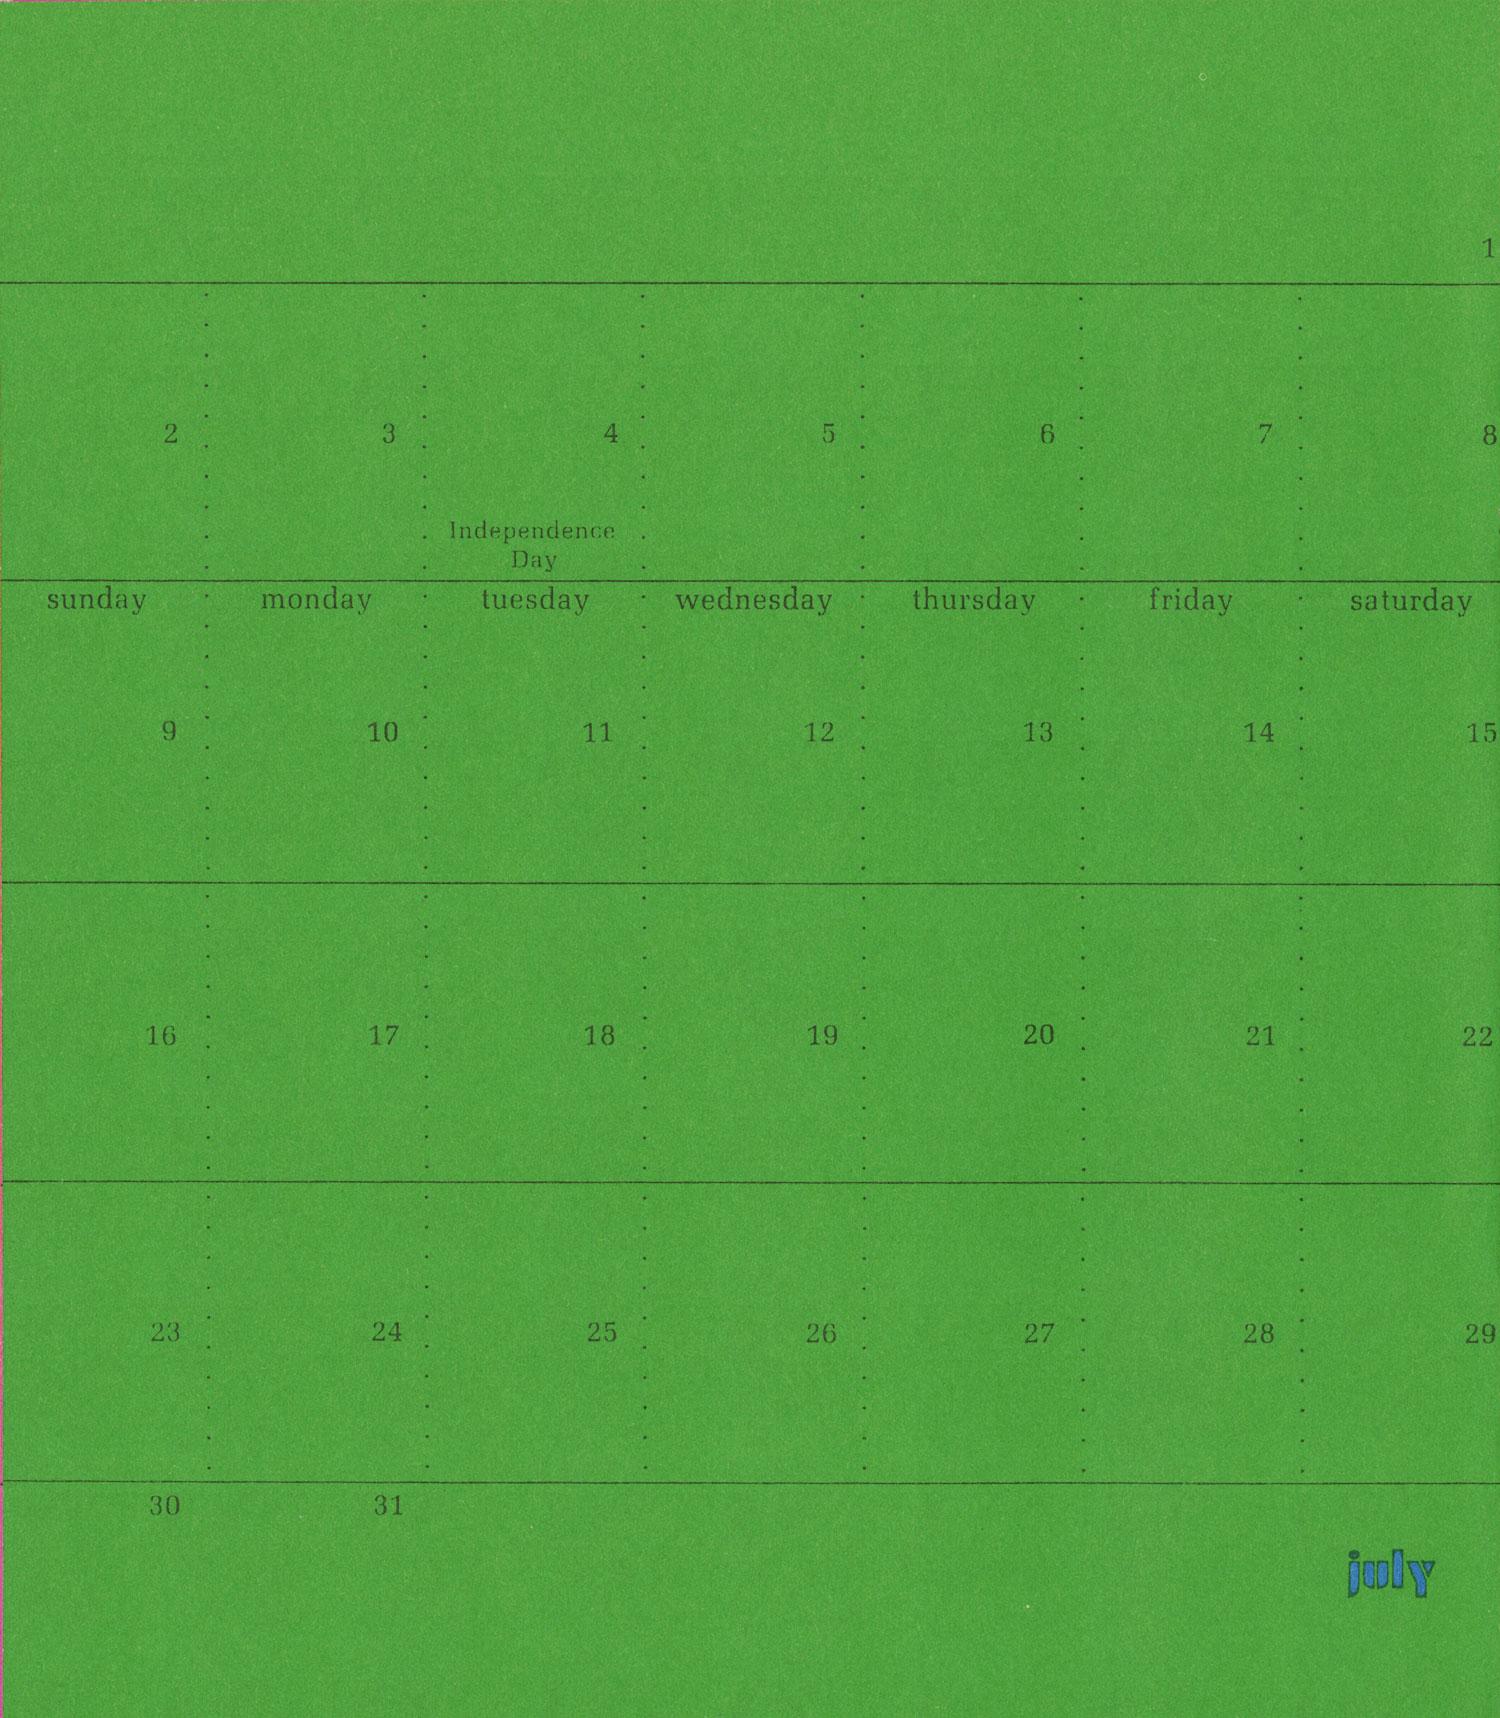 casual-corner-calendar-left-8.jpg